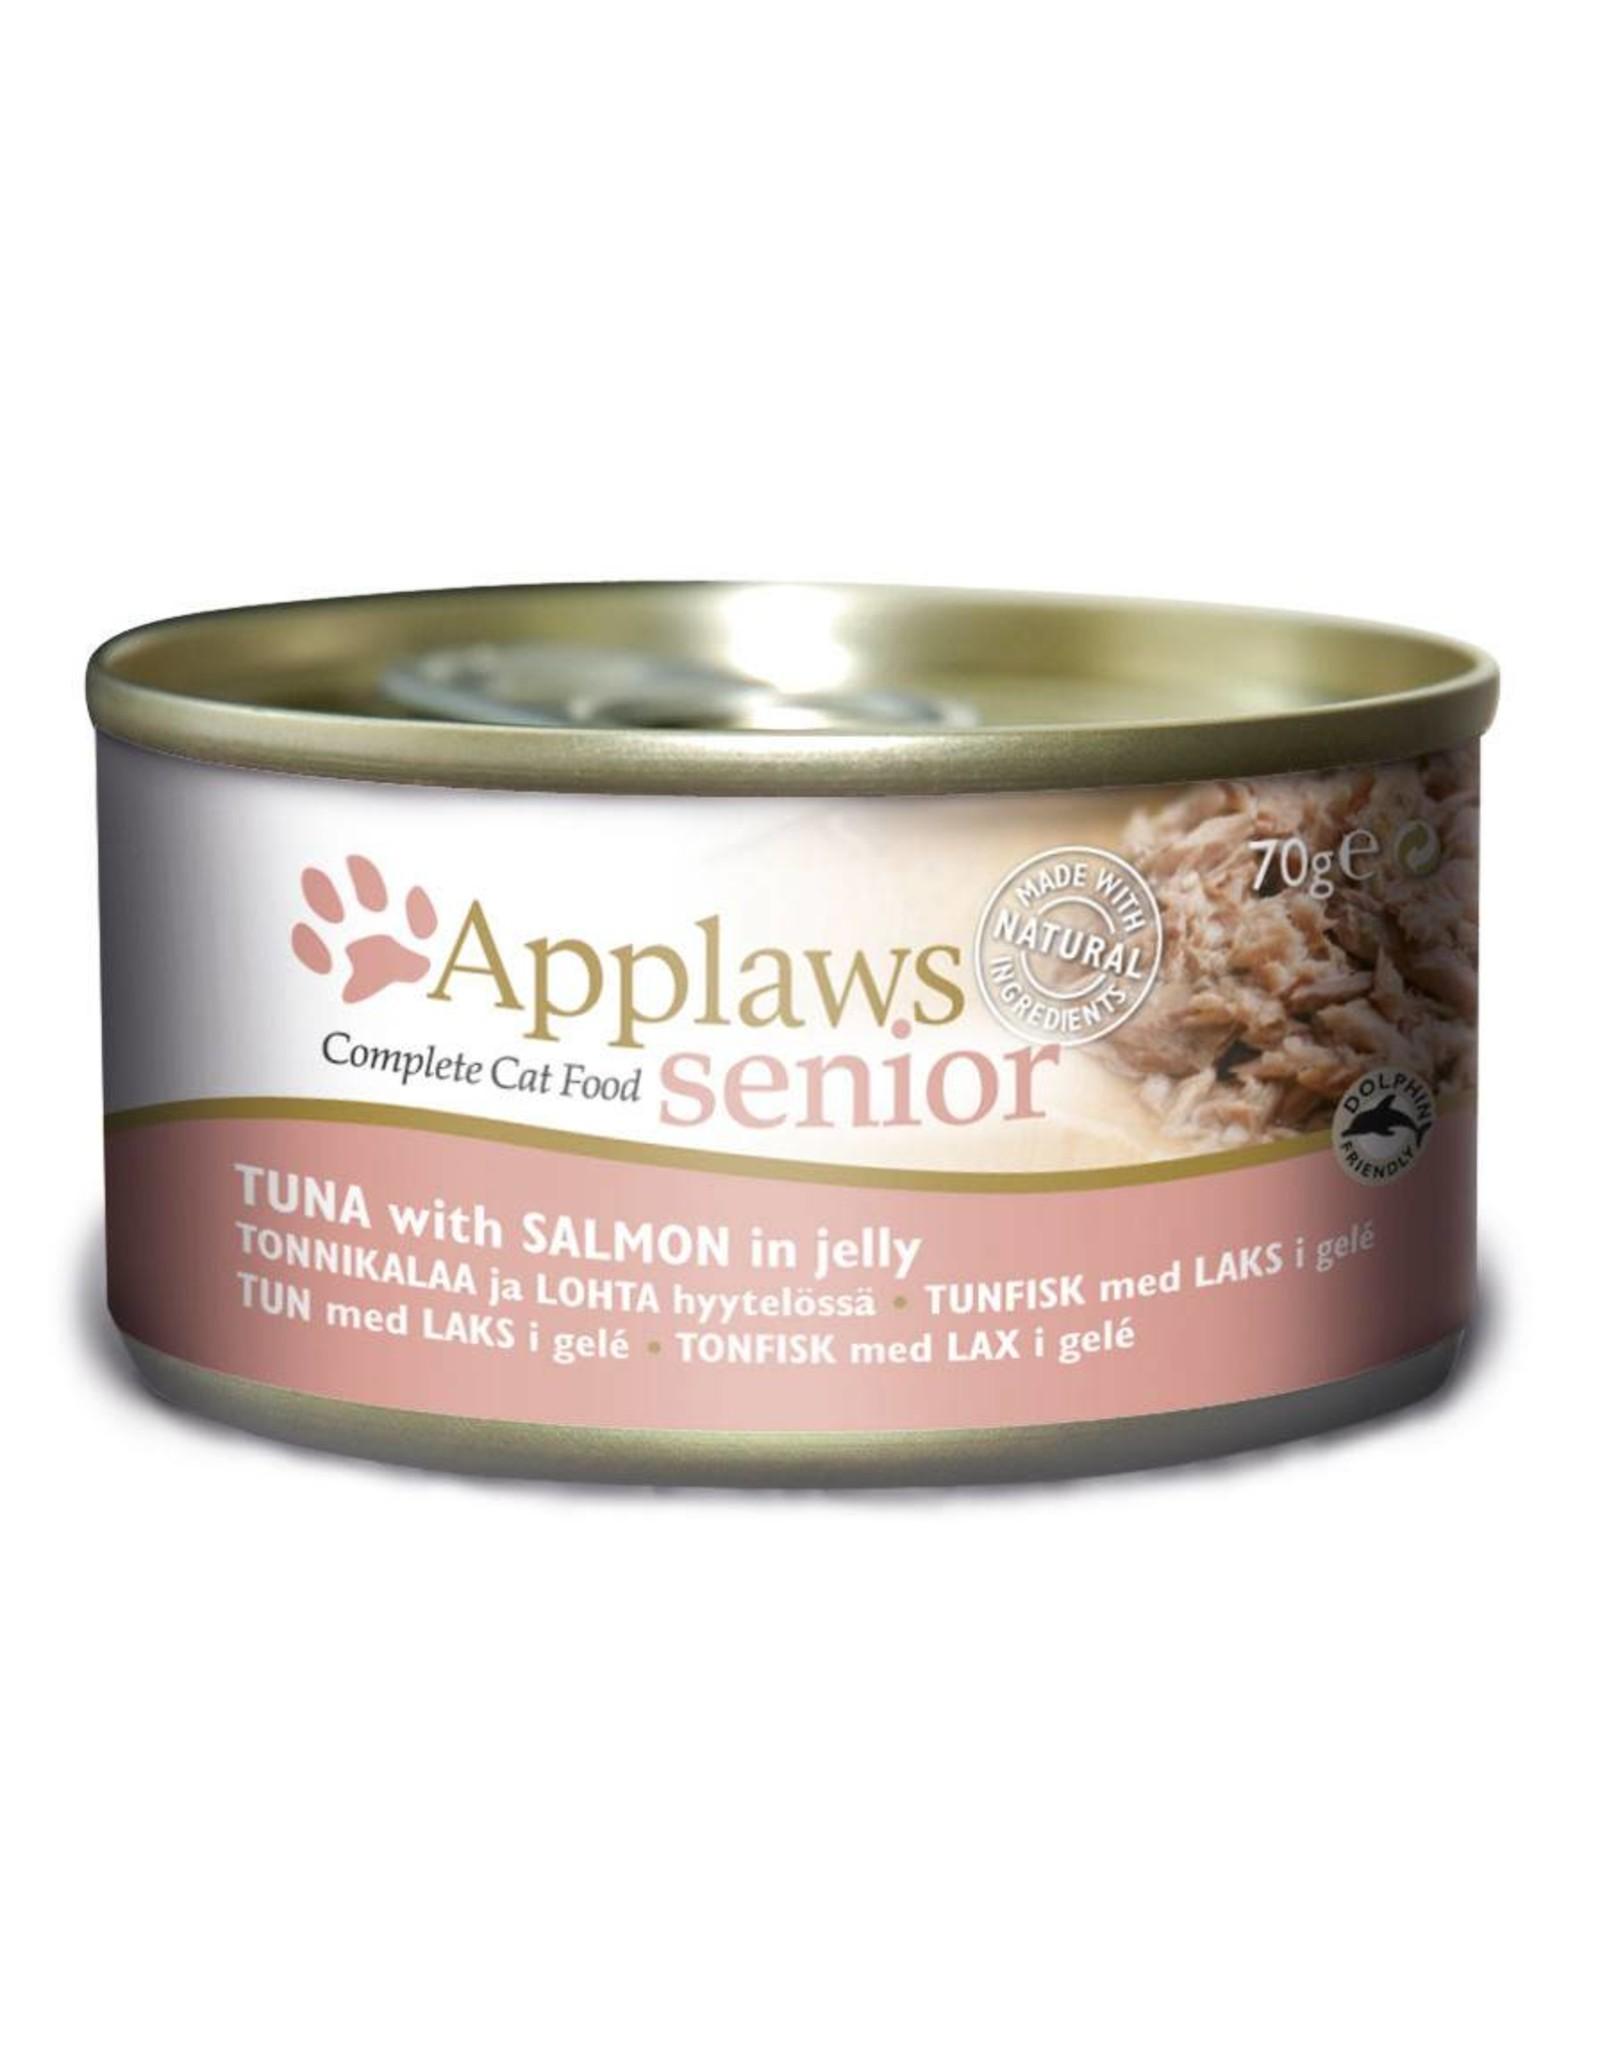 Applaws Cat Wet Food Senior Tuna with Salmon 70g